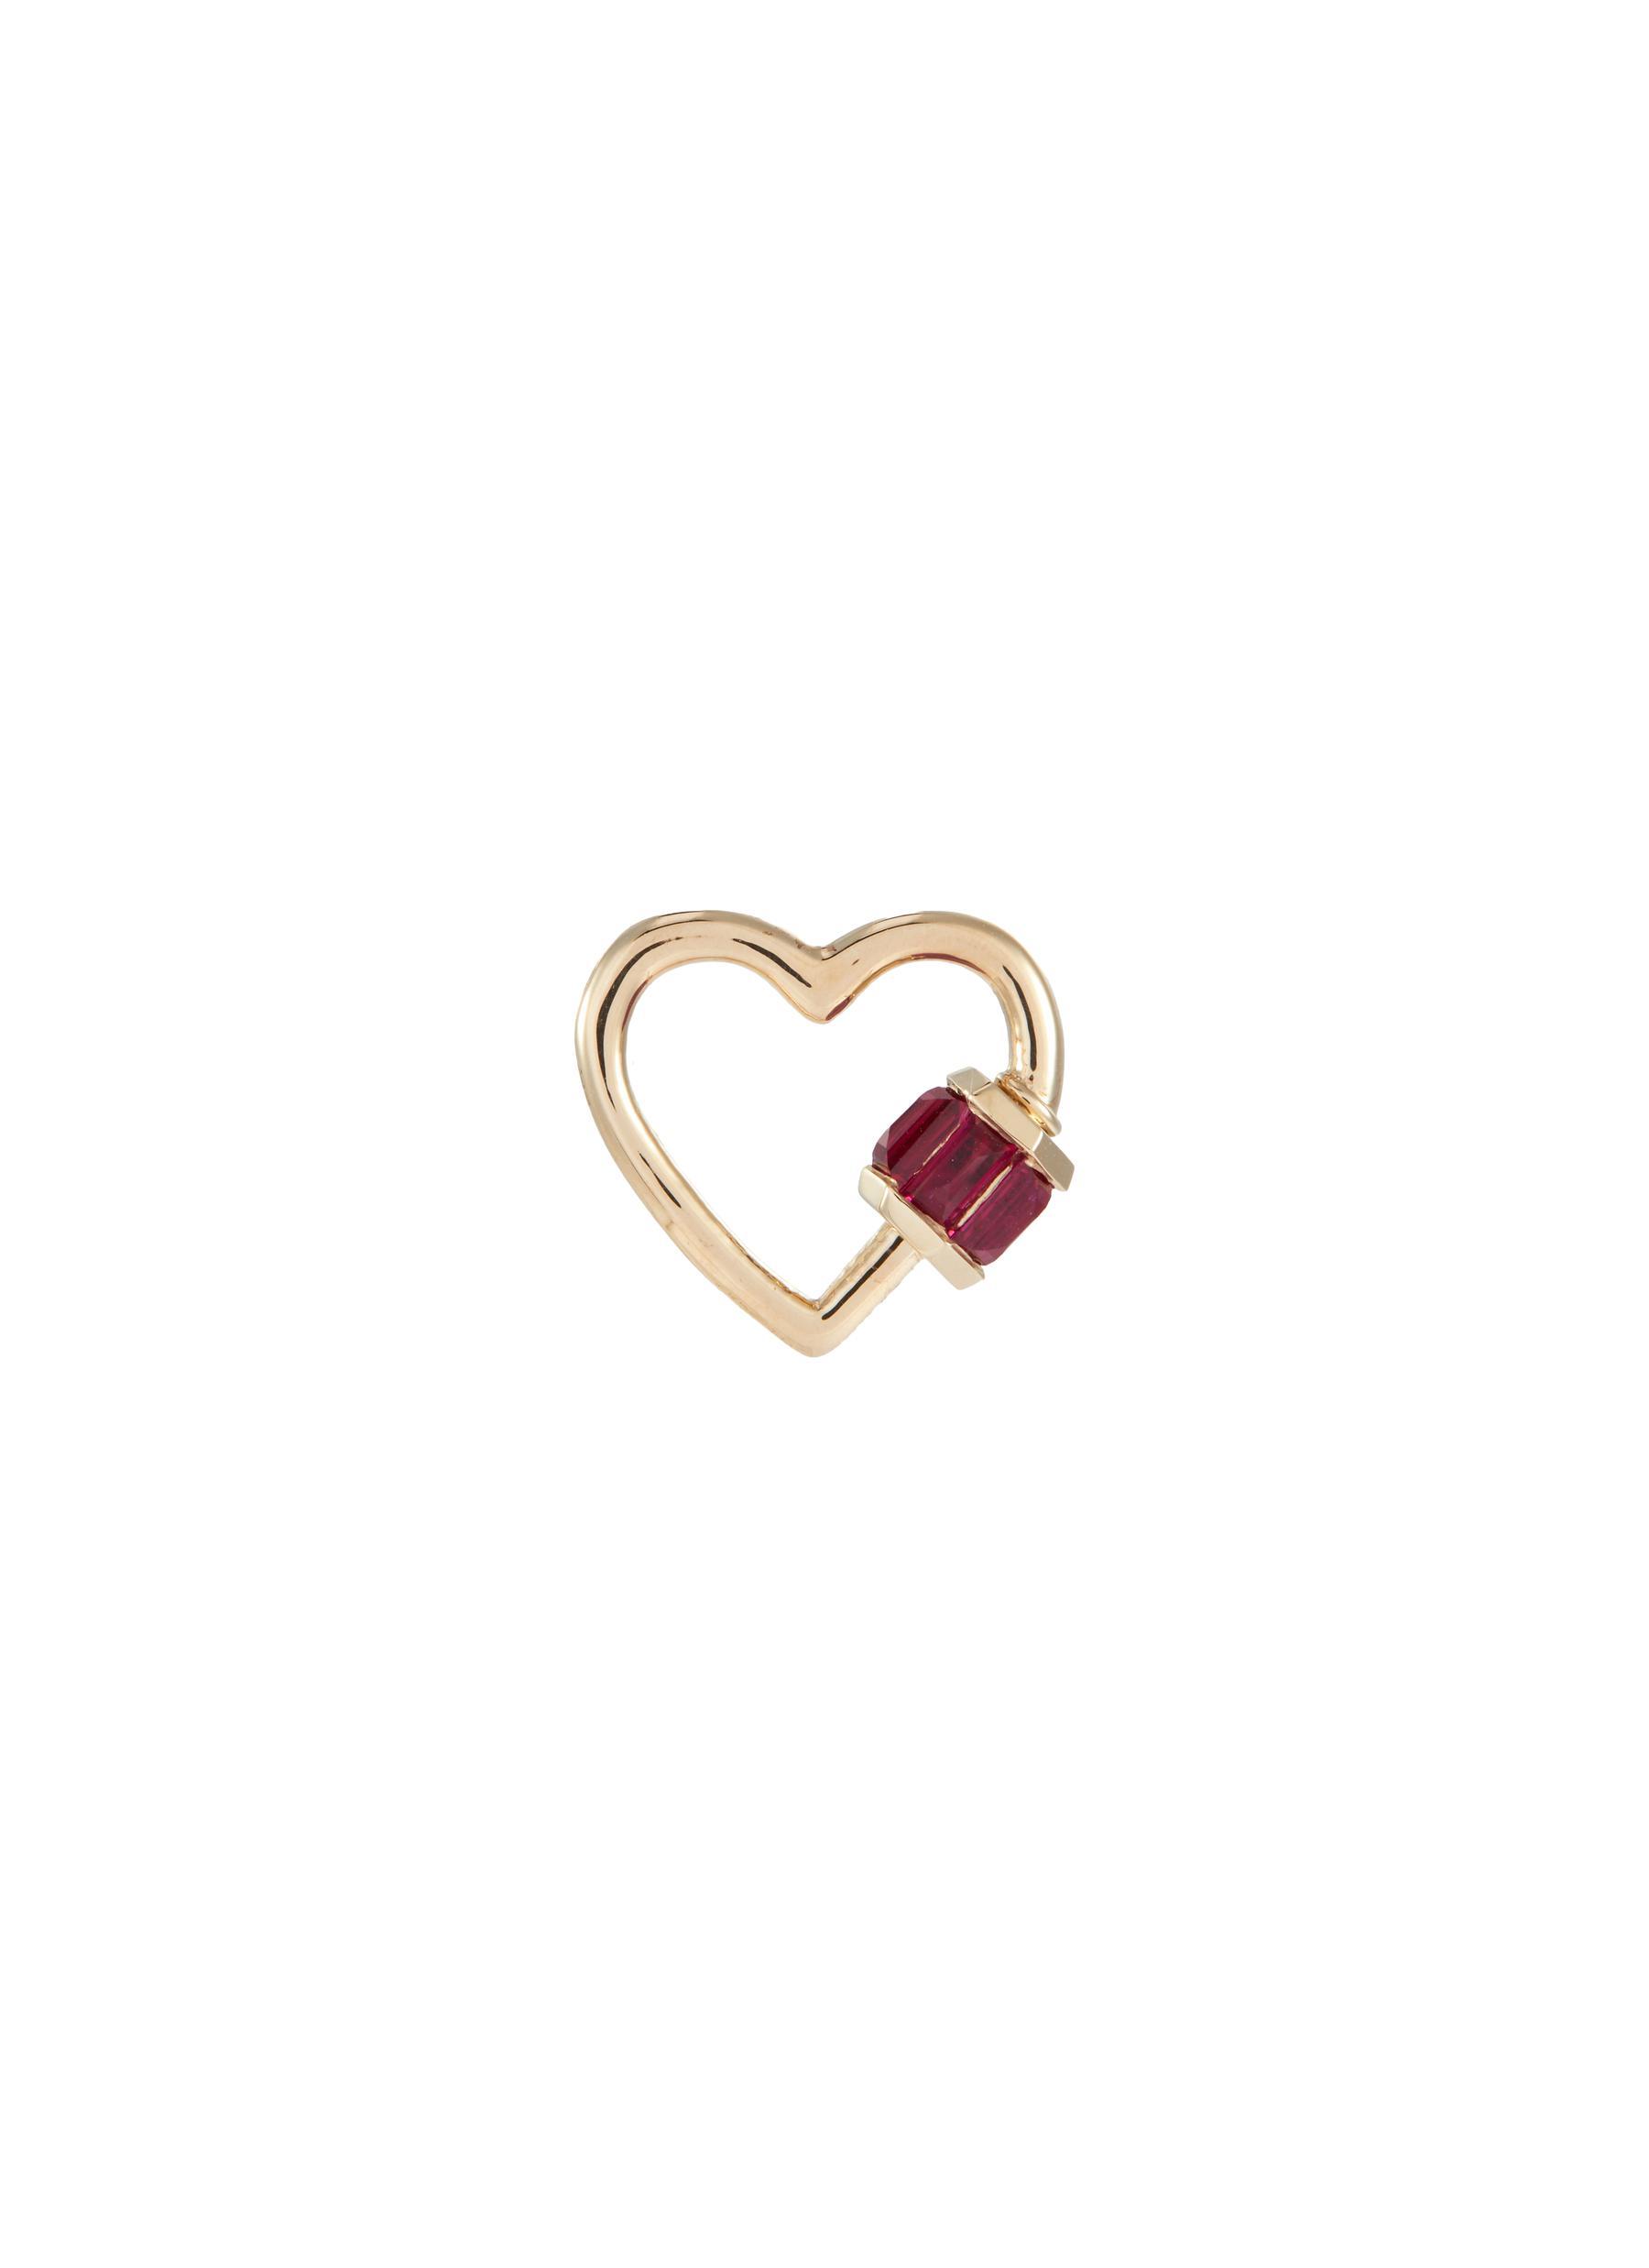 'Heart' ruby 14k yellow gold baby lock